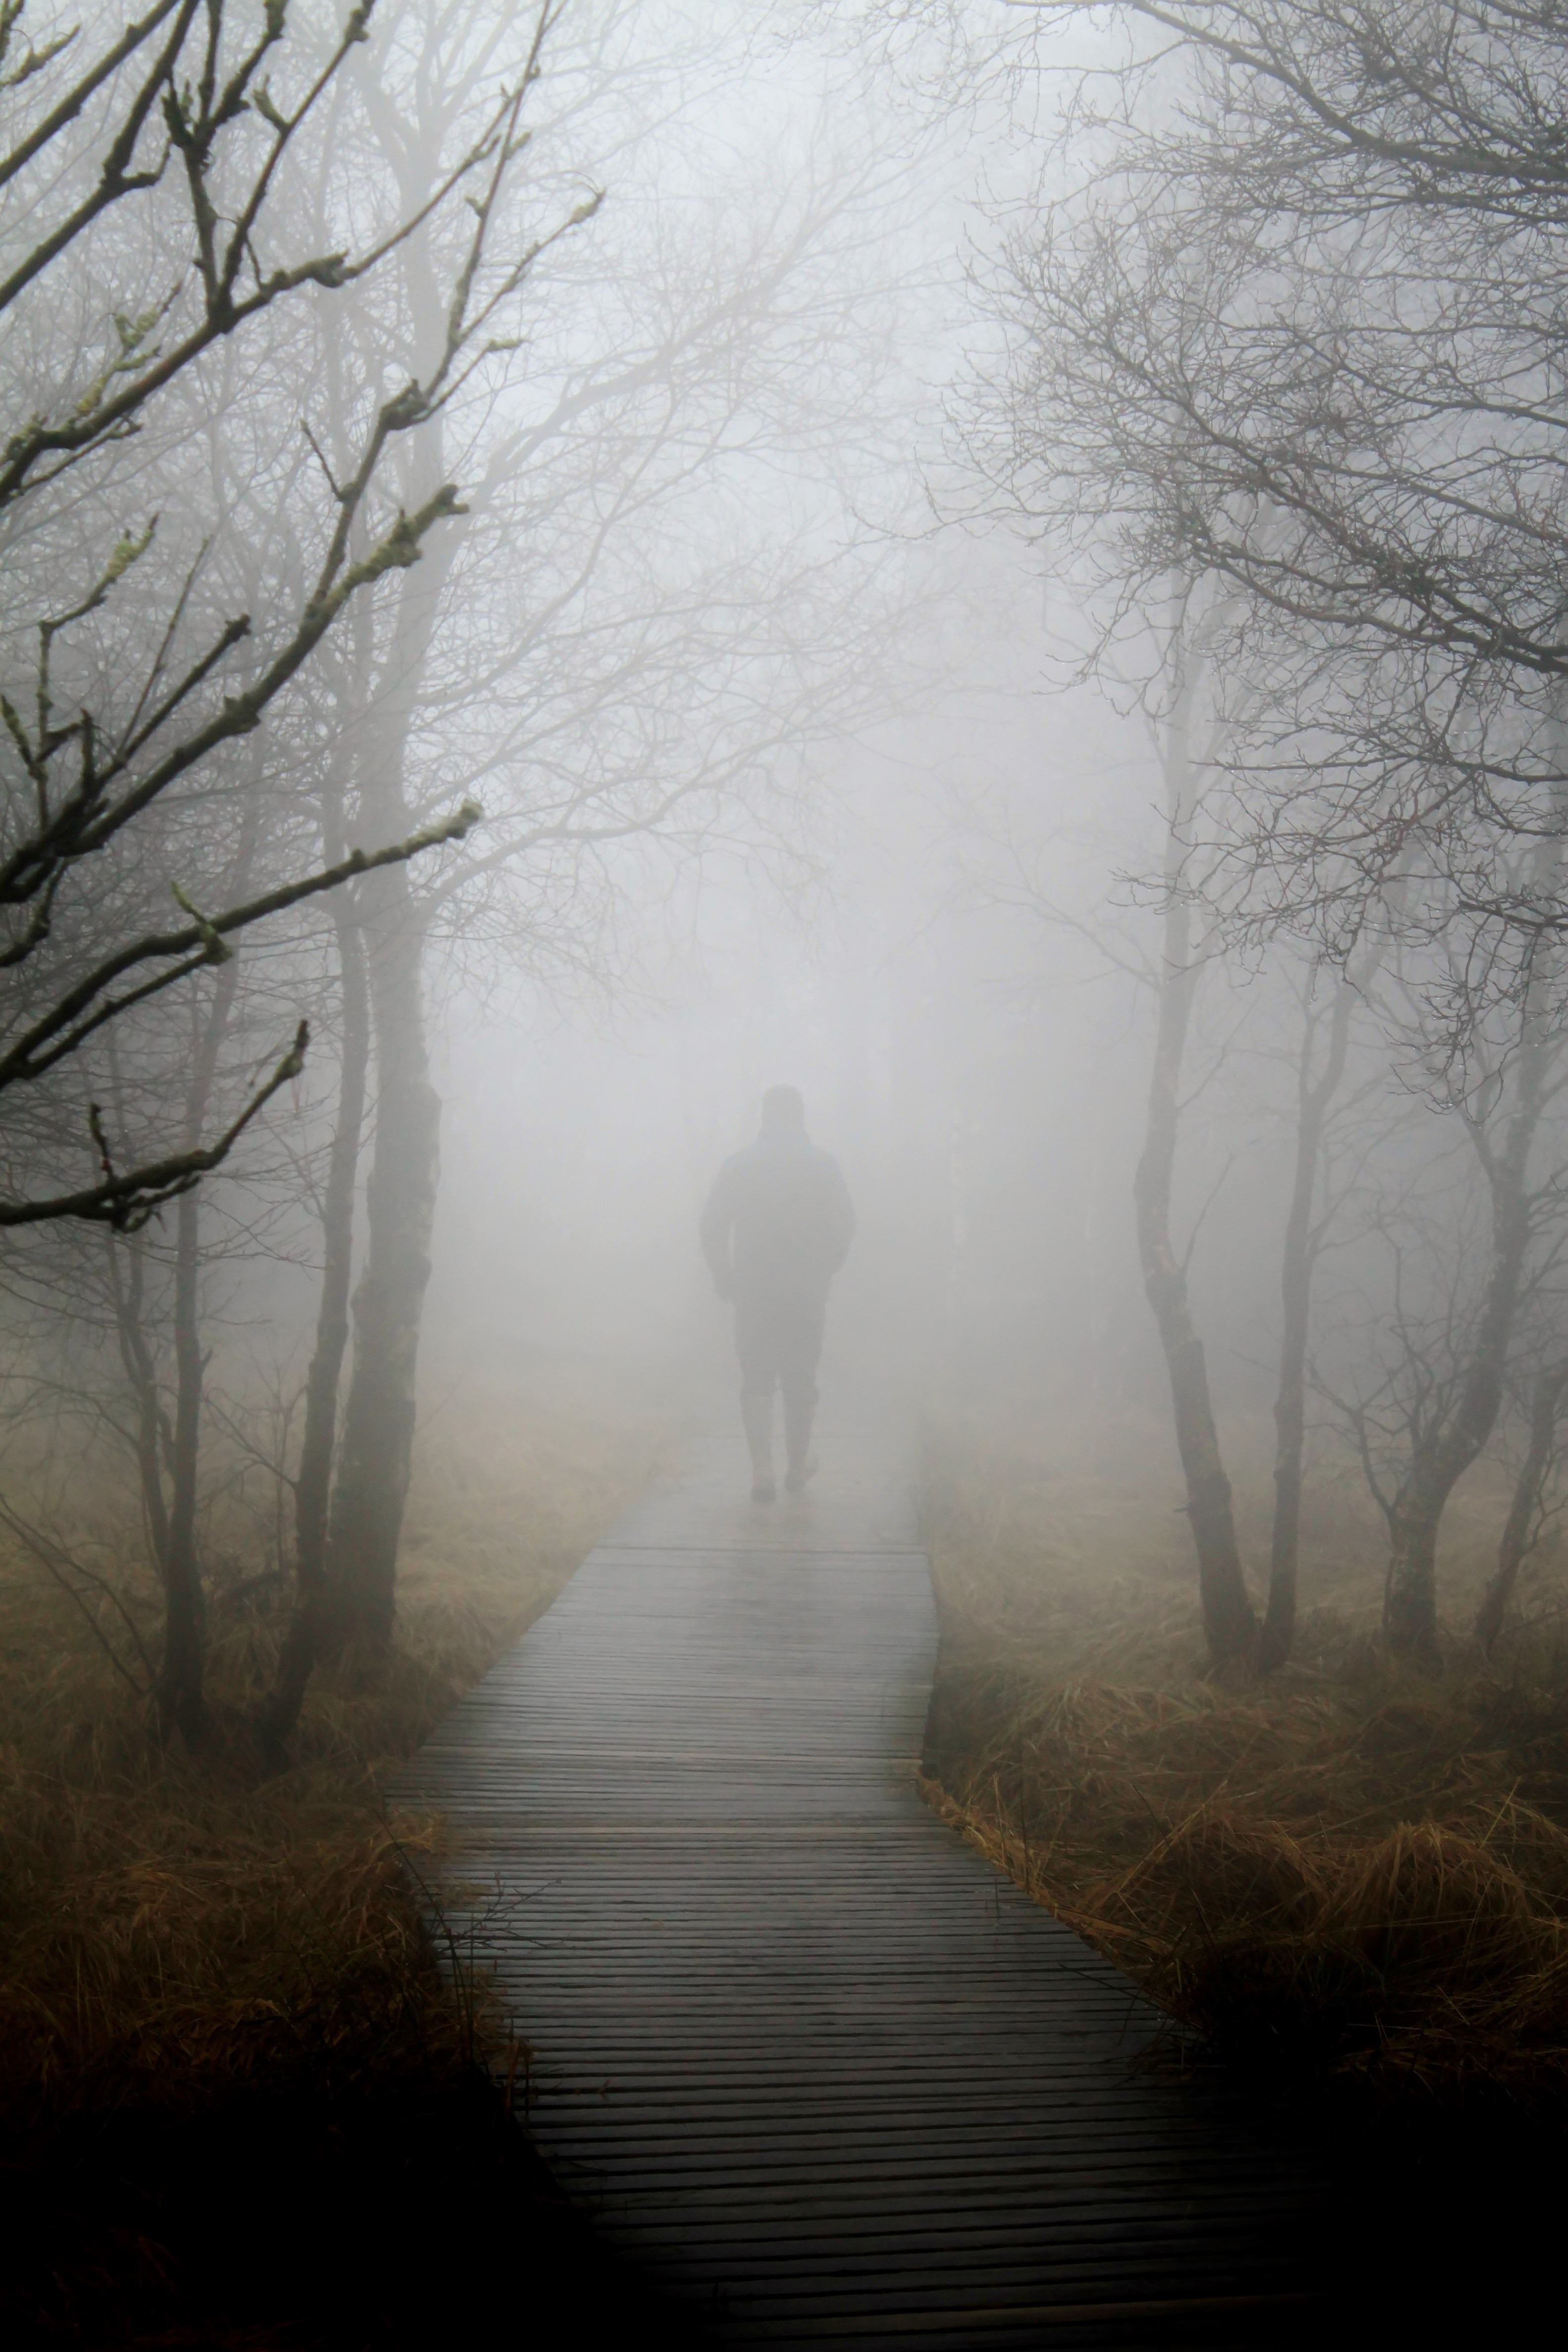 Route, Activity, Fog, Foggy, Human, HQ Photo